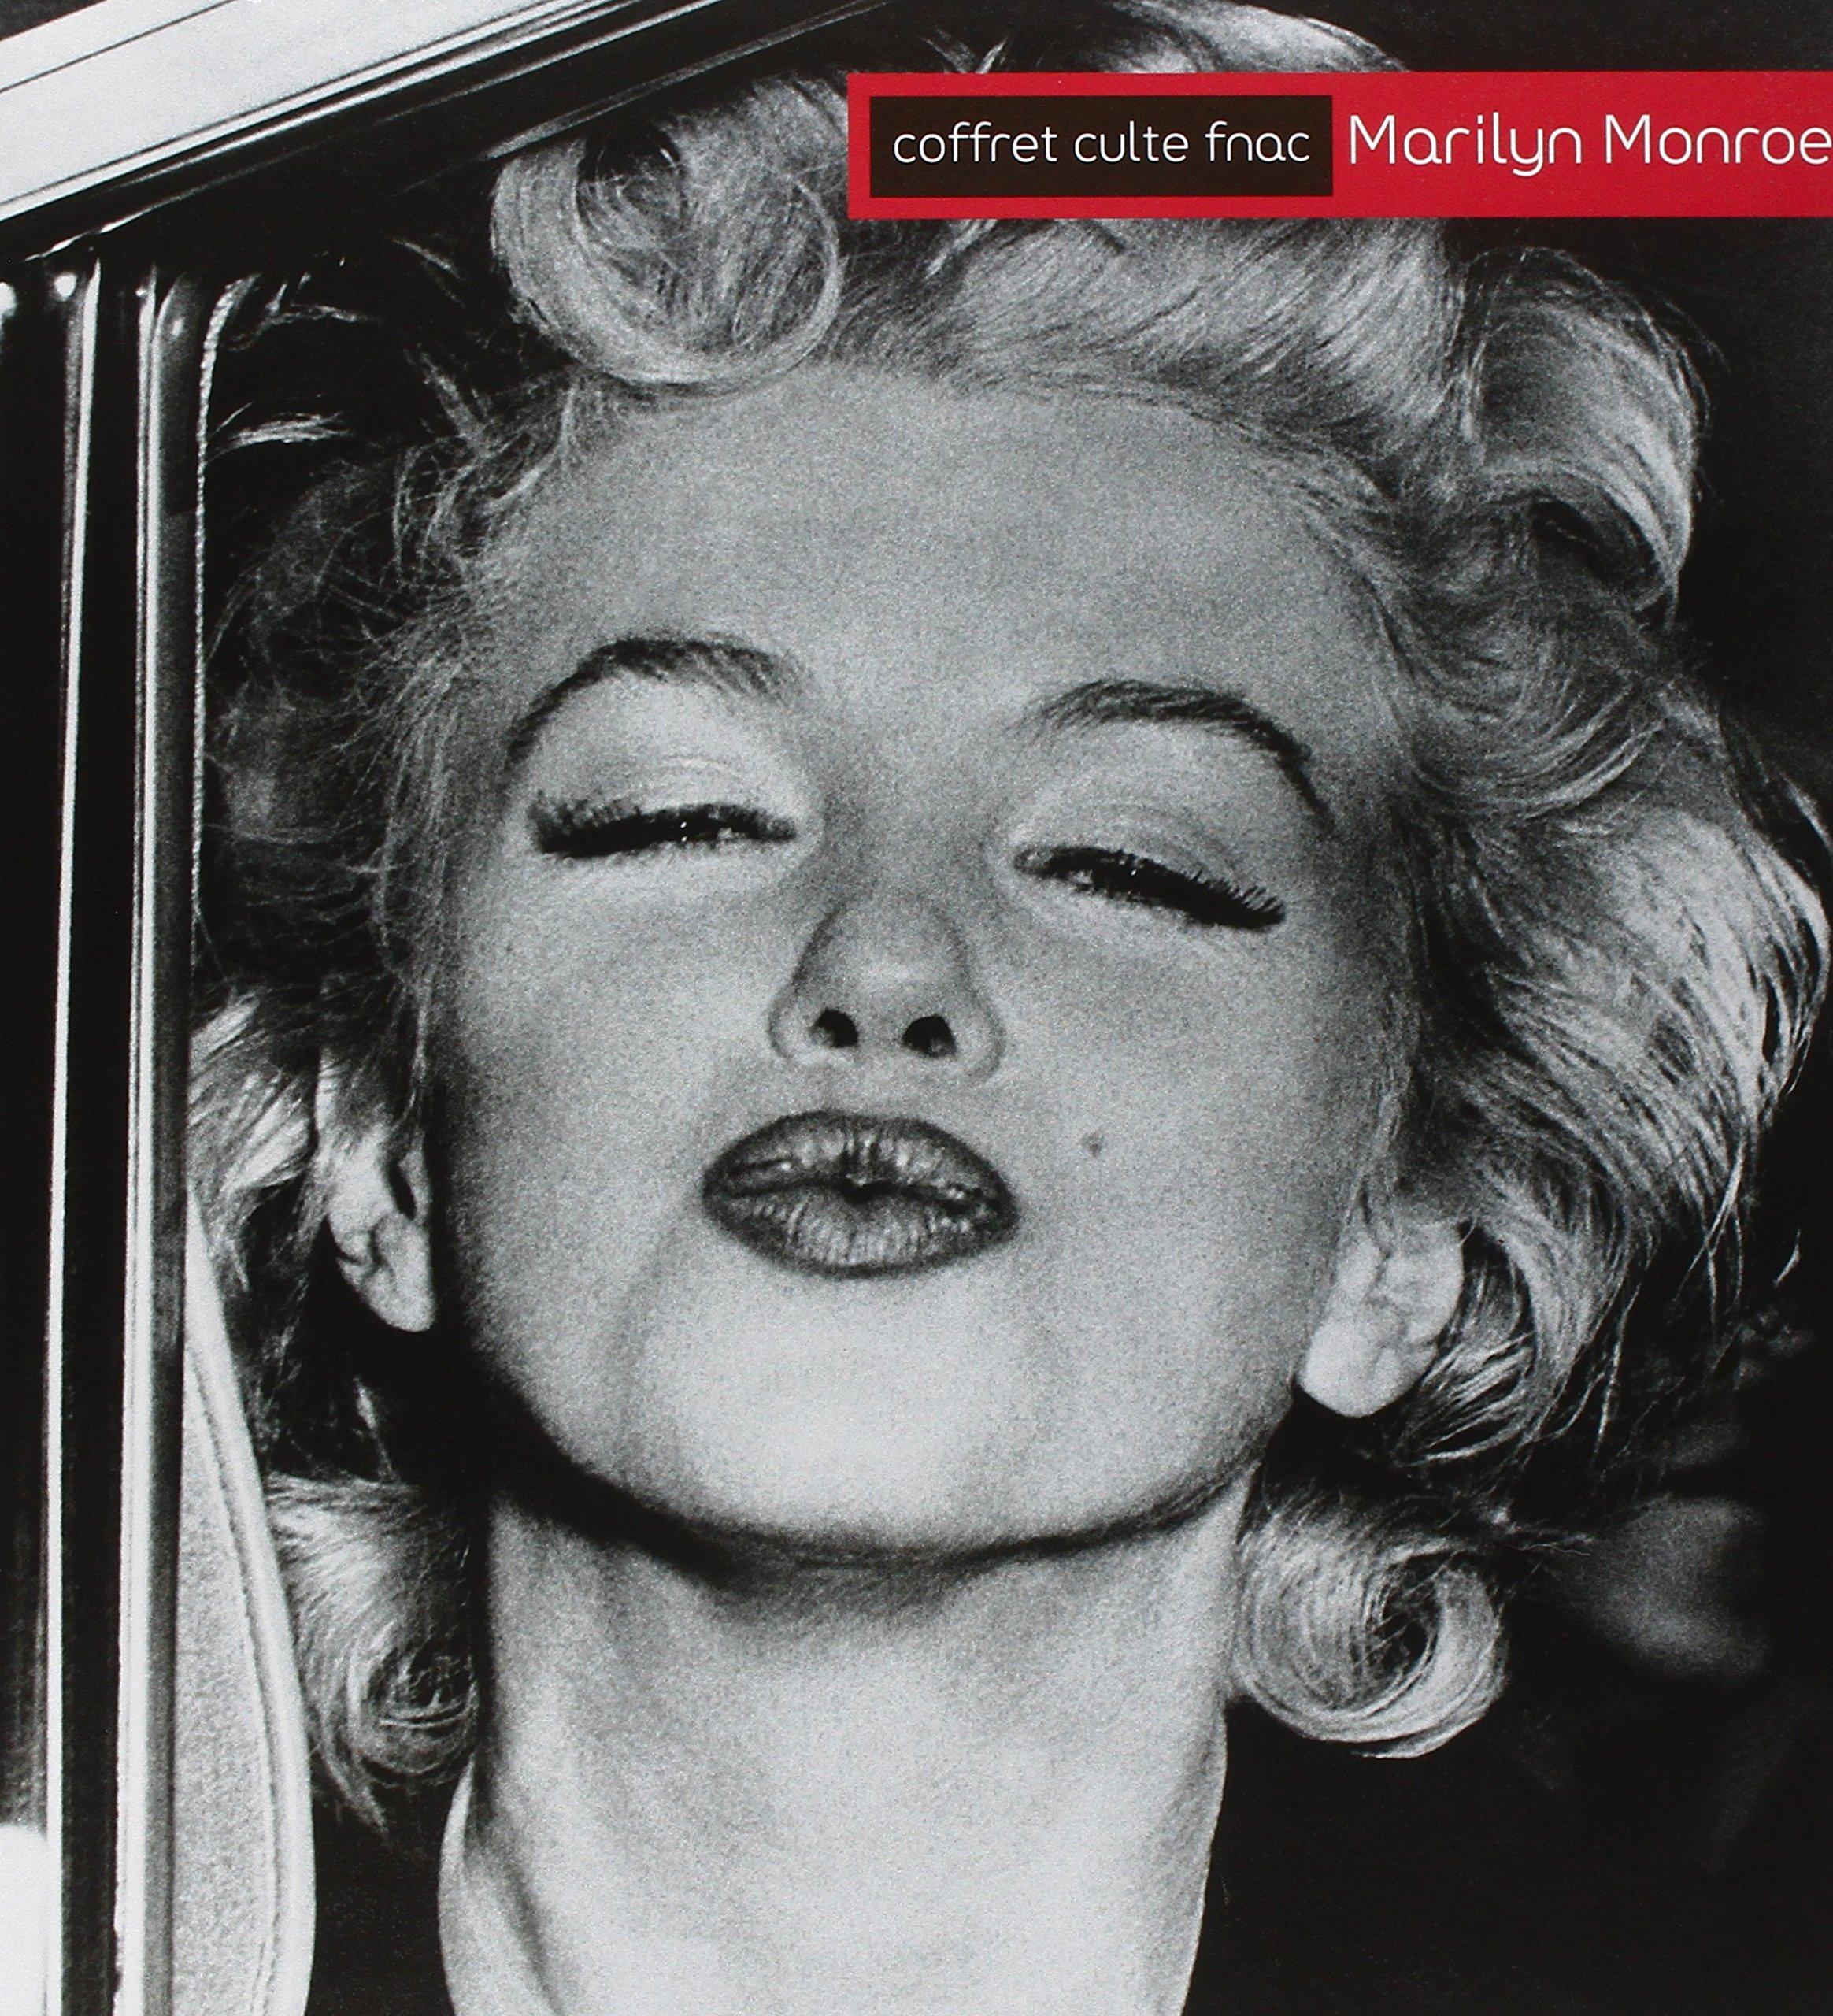 MARILYN MONROE - COFFRET CULTE (26X29CM) (CD+DV (CD)